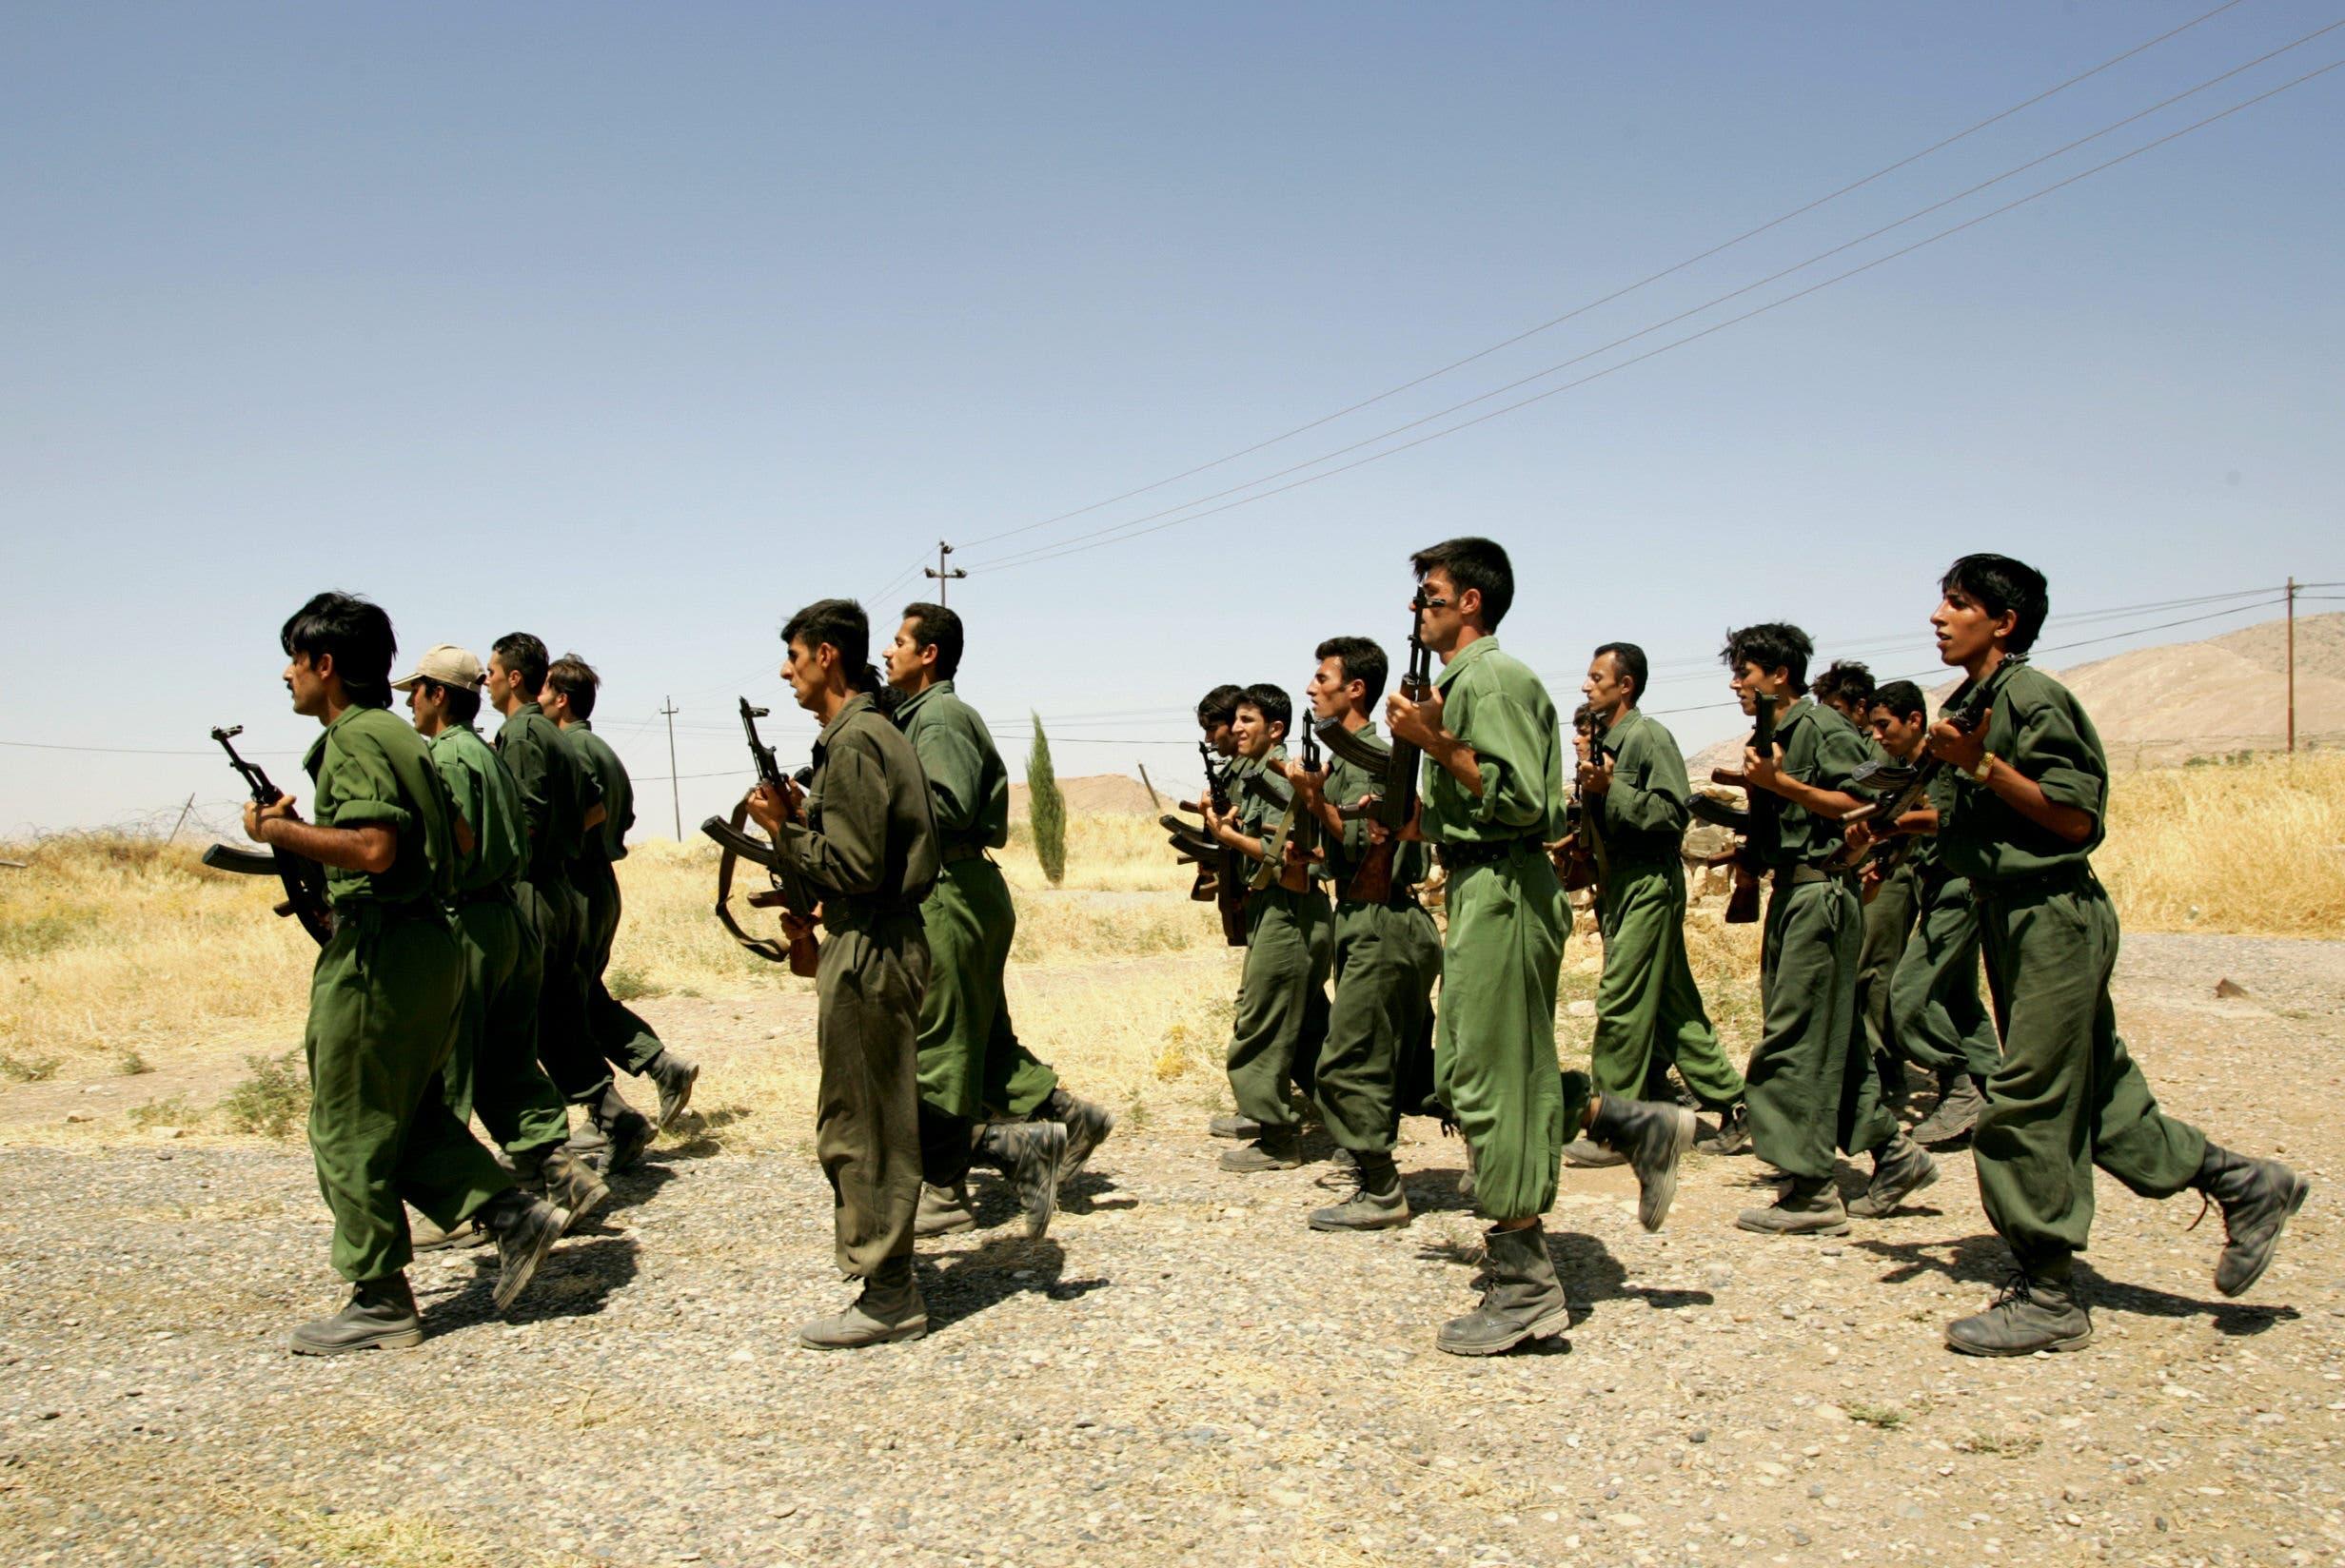 Pesmerga of the Democratic Party of Iranian Kurdistan (PDKI) train during military training at camp Koysancak in Sulaymaniyah in Iraq, 13 August 2005.  (AFP)